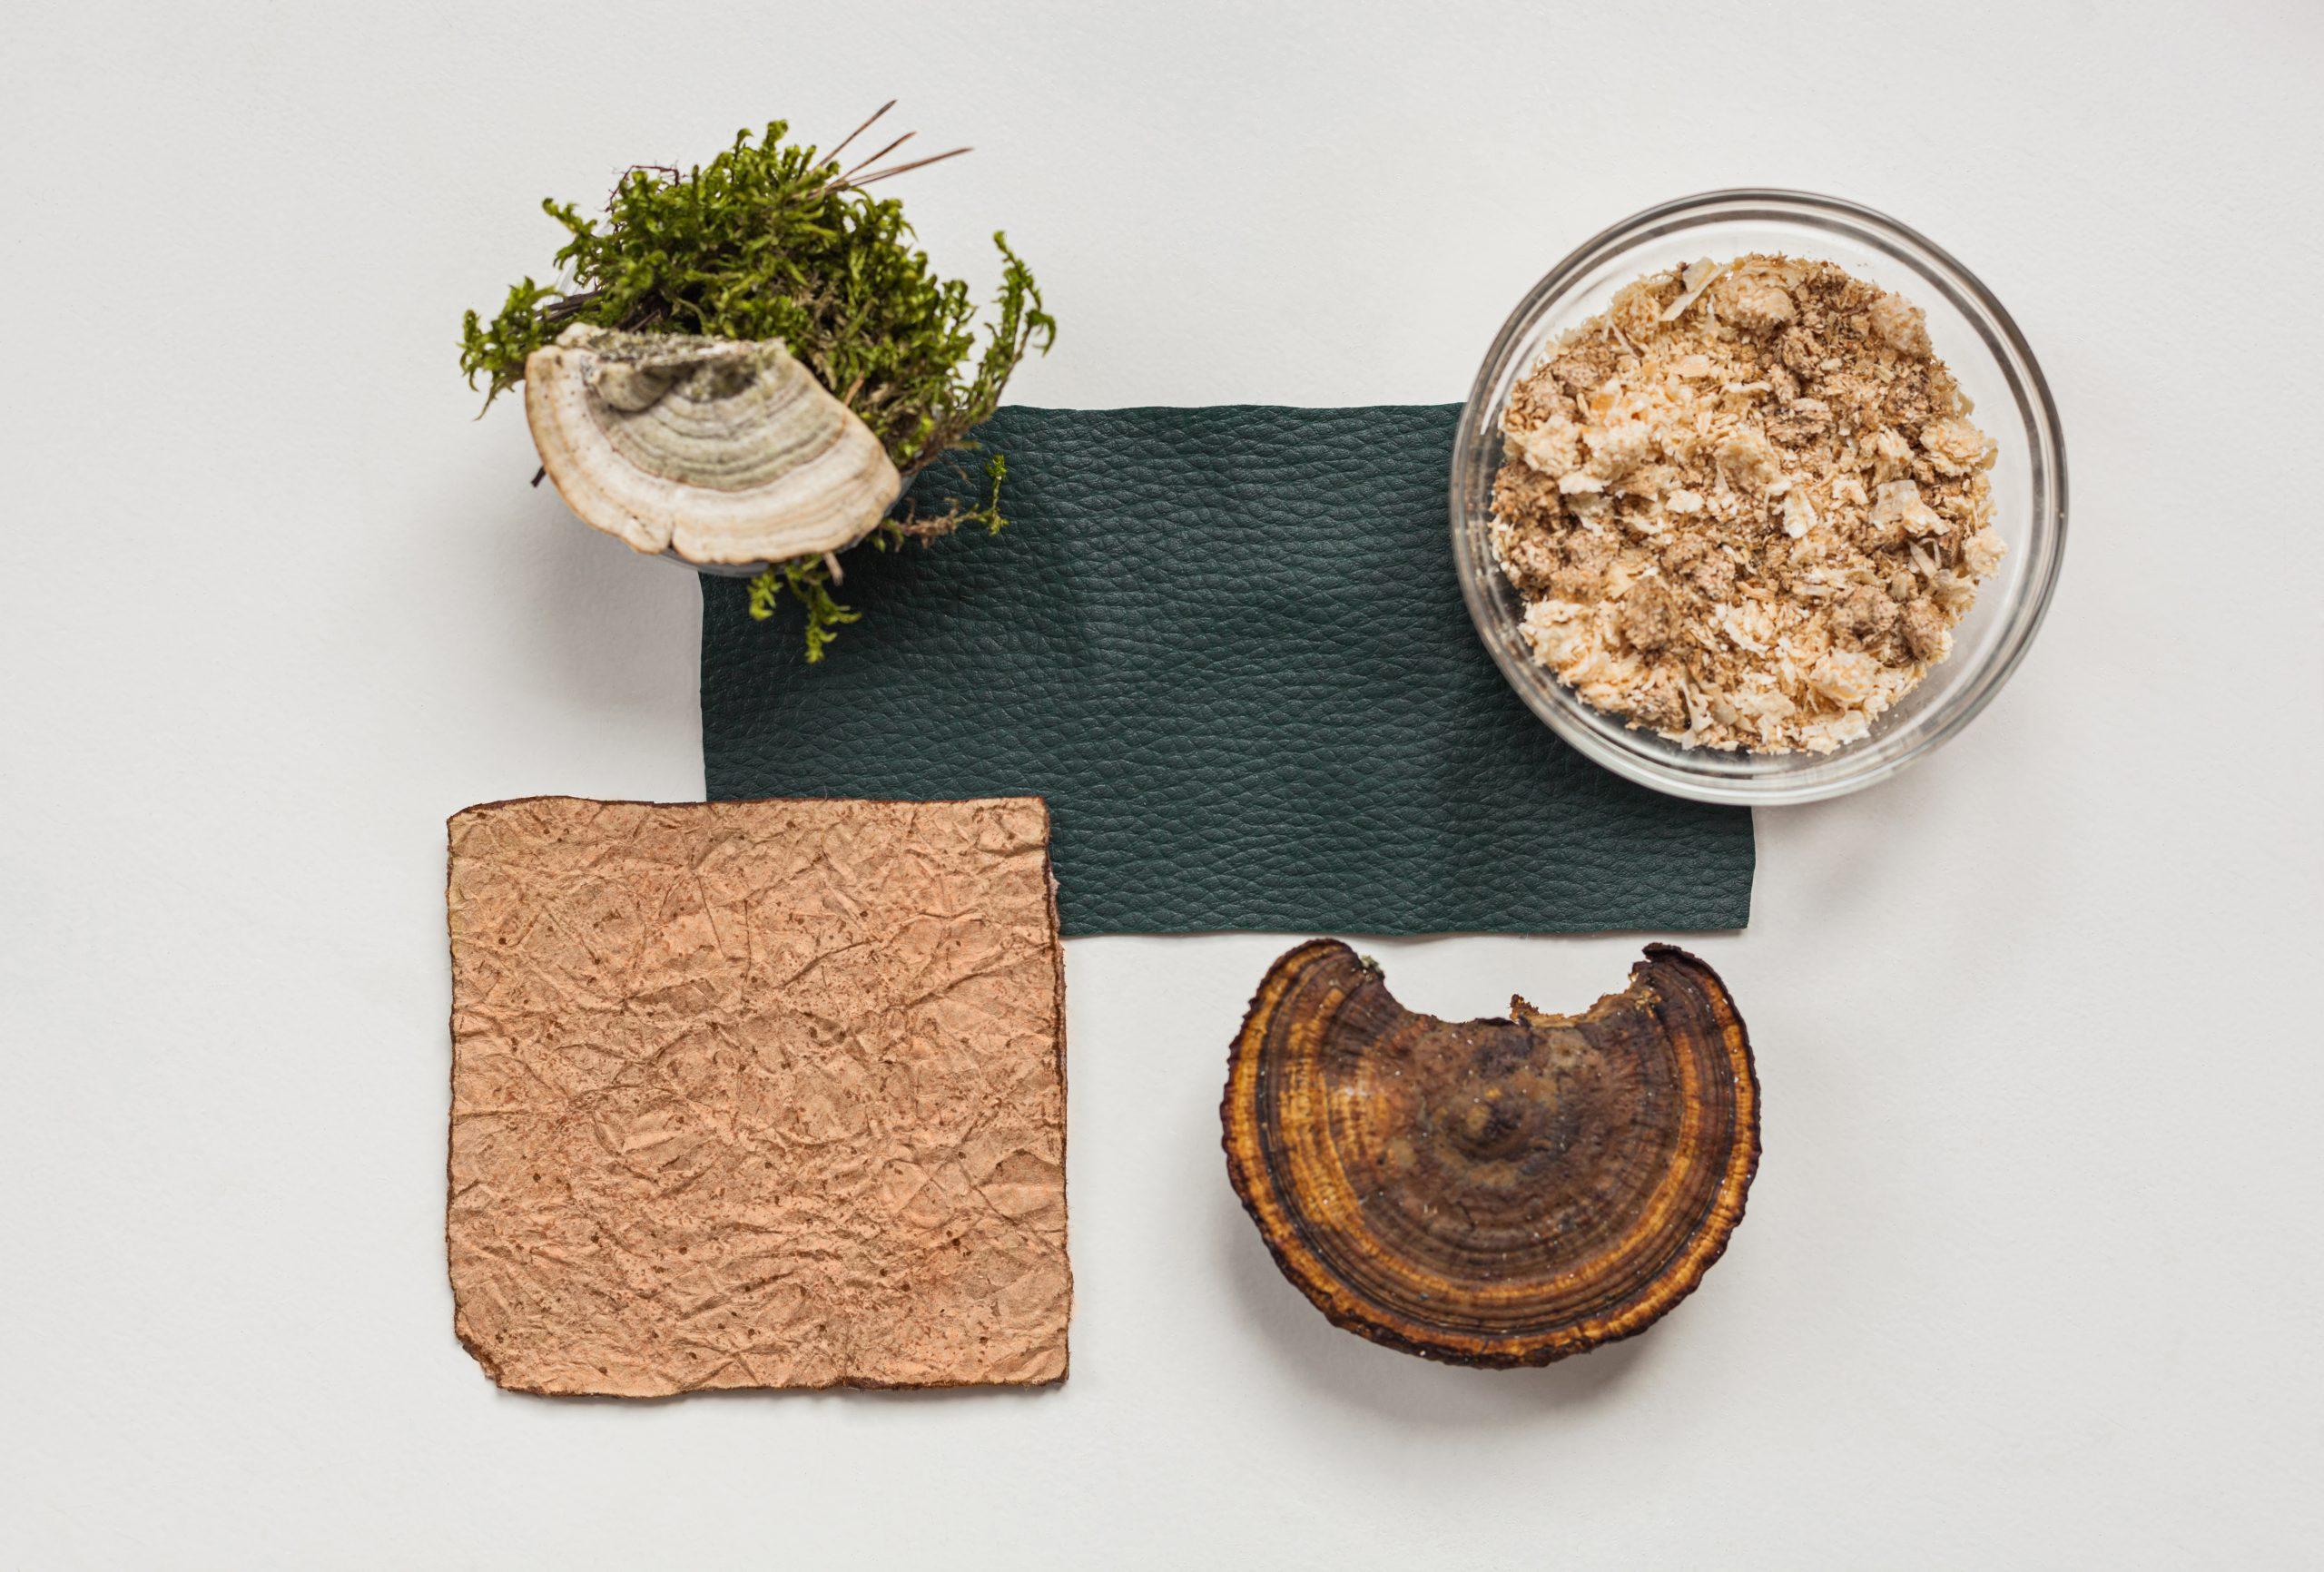 vegan leather with mushrooms